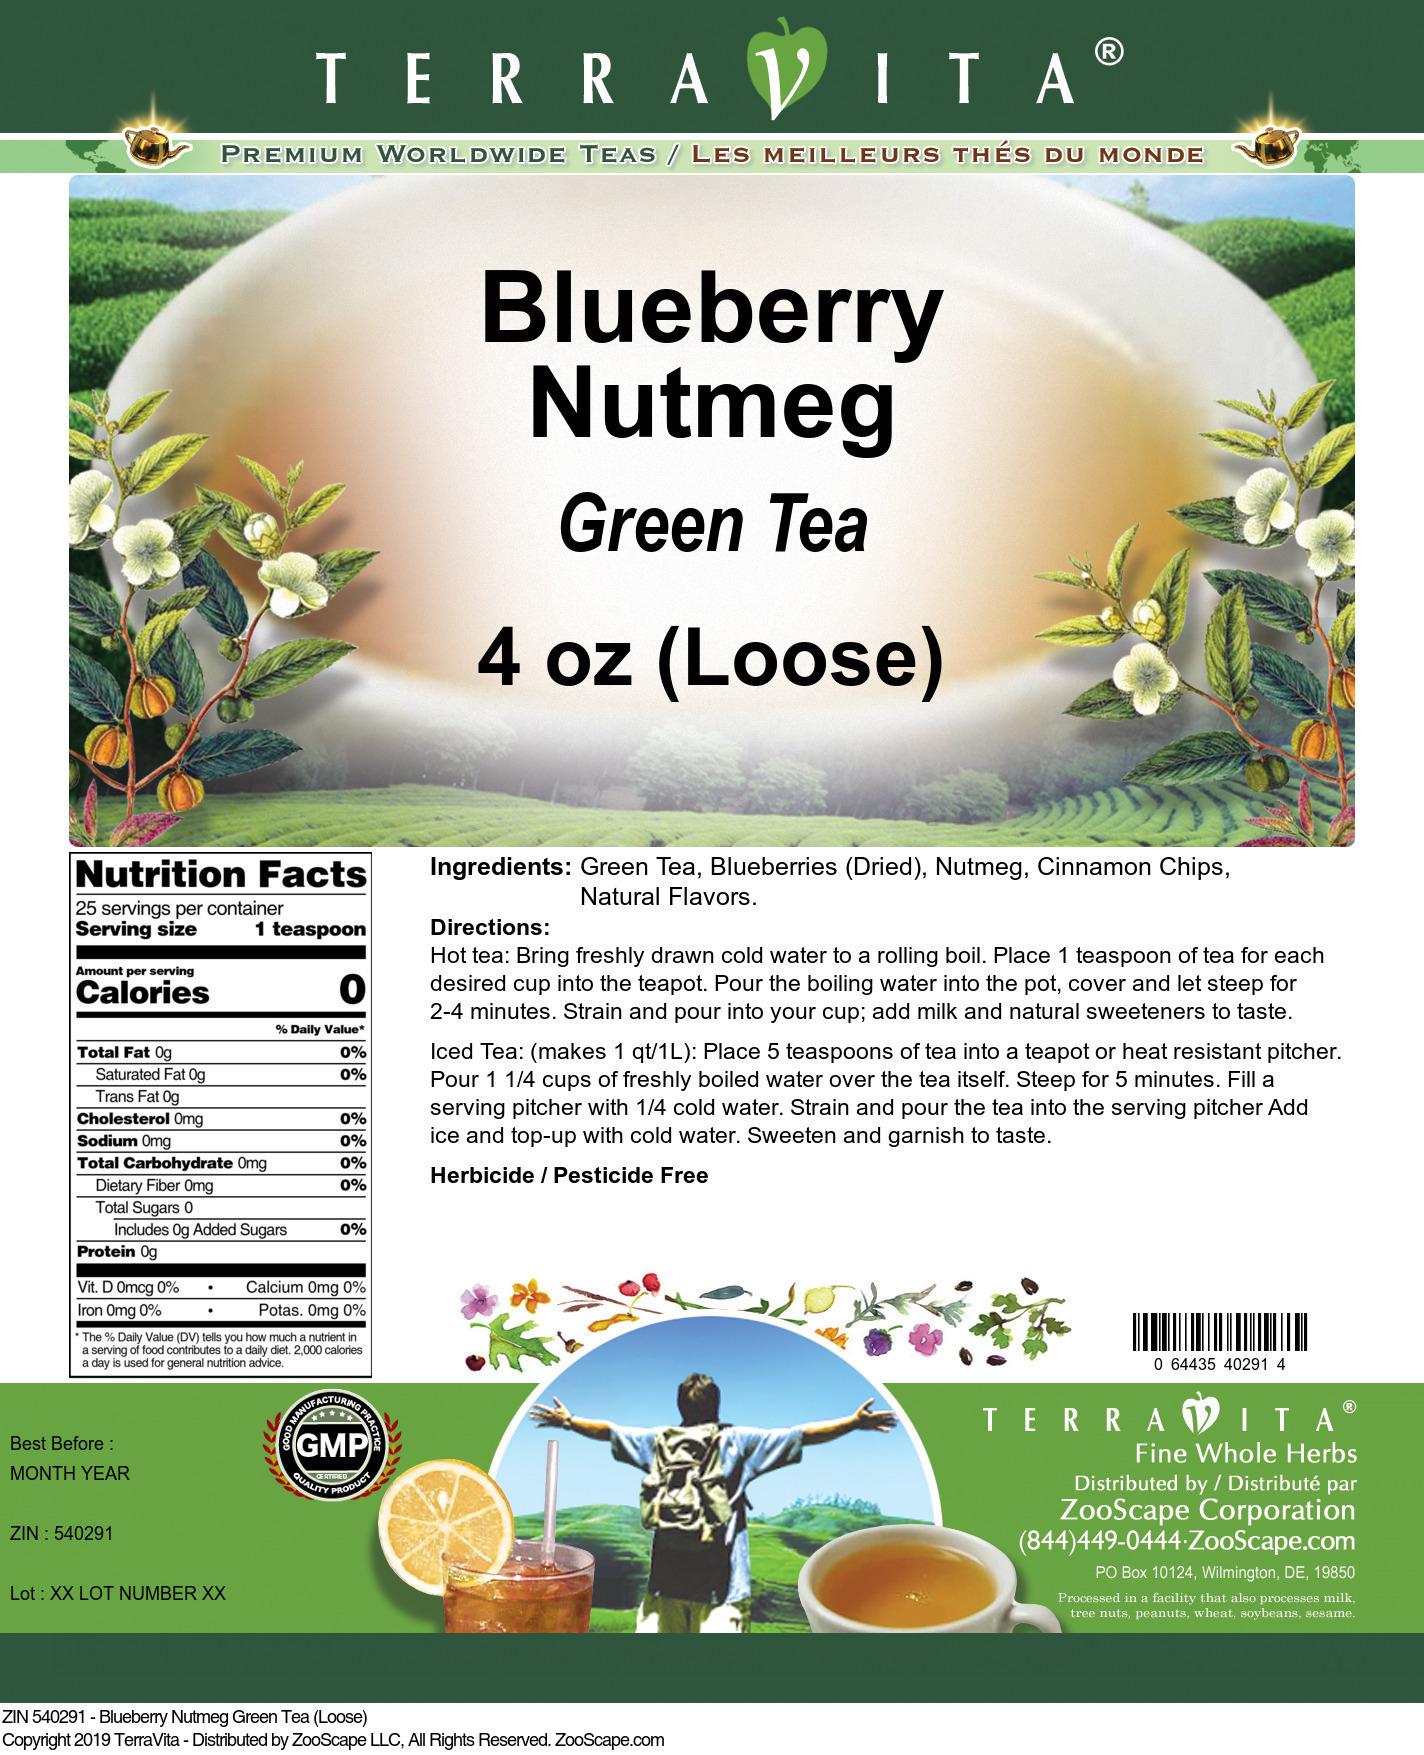 Blueberry Nutmeg Green Tea (Loose)